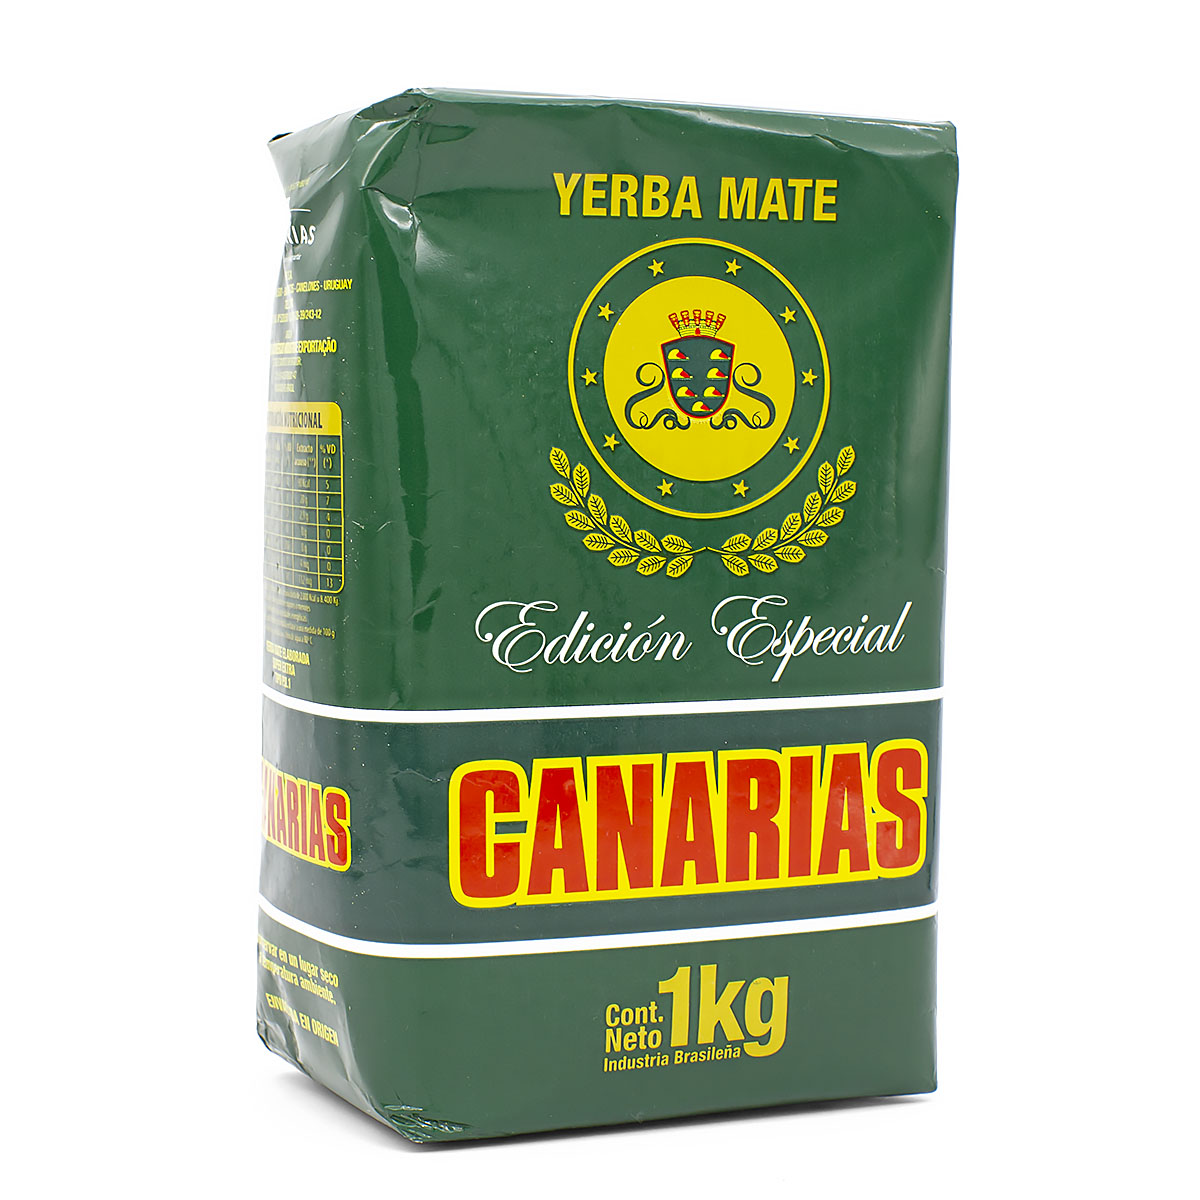 Мате Canarias Especial, 1000 г мате pipore especial 1000 г